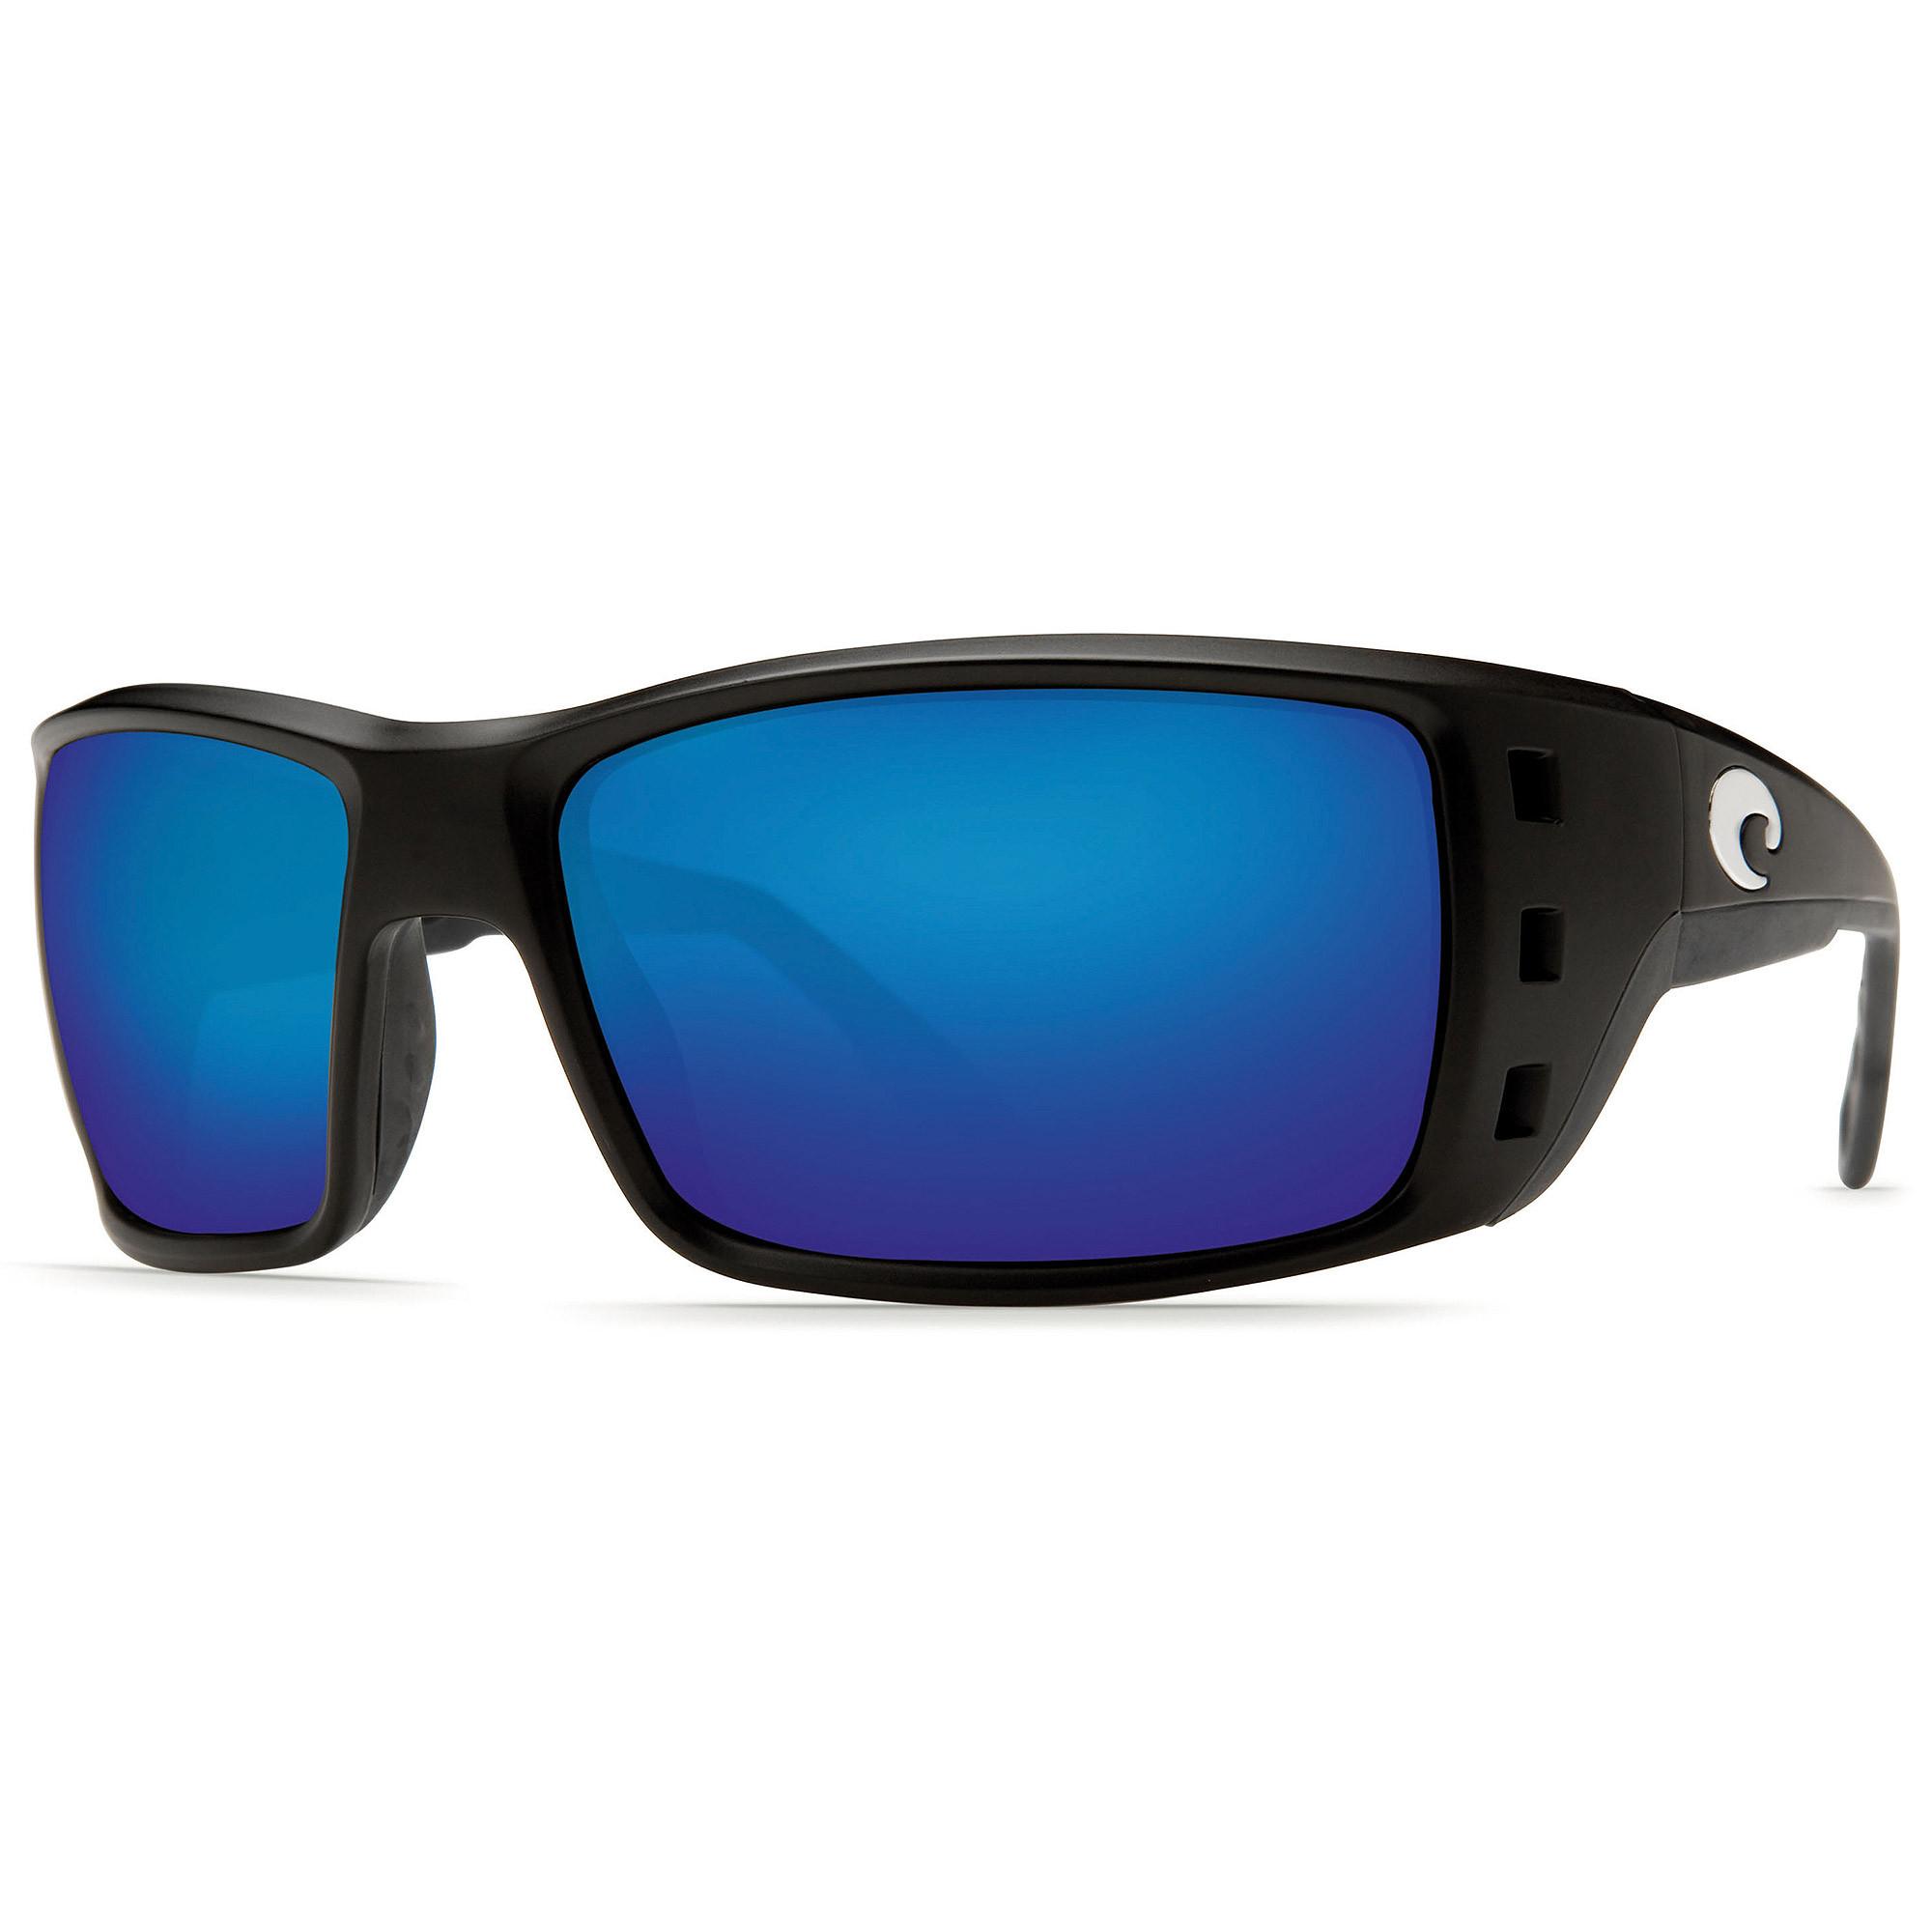 Costa Permit Polarisationsbrille | flyfishingeurope-shop.de